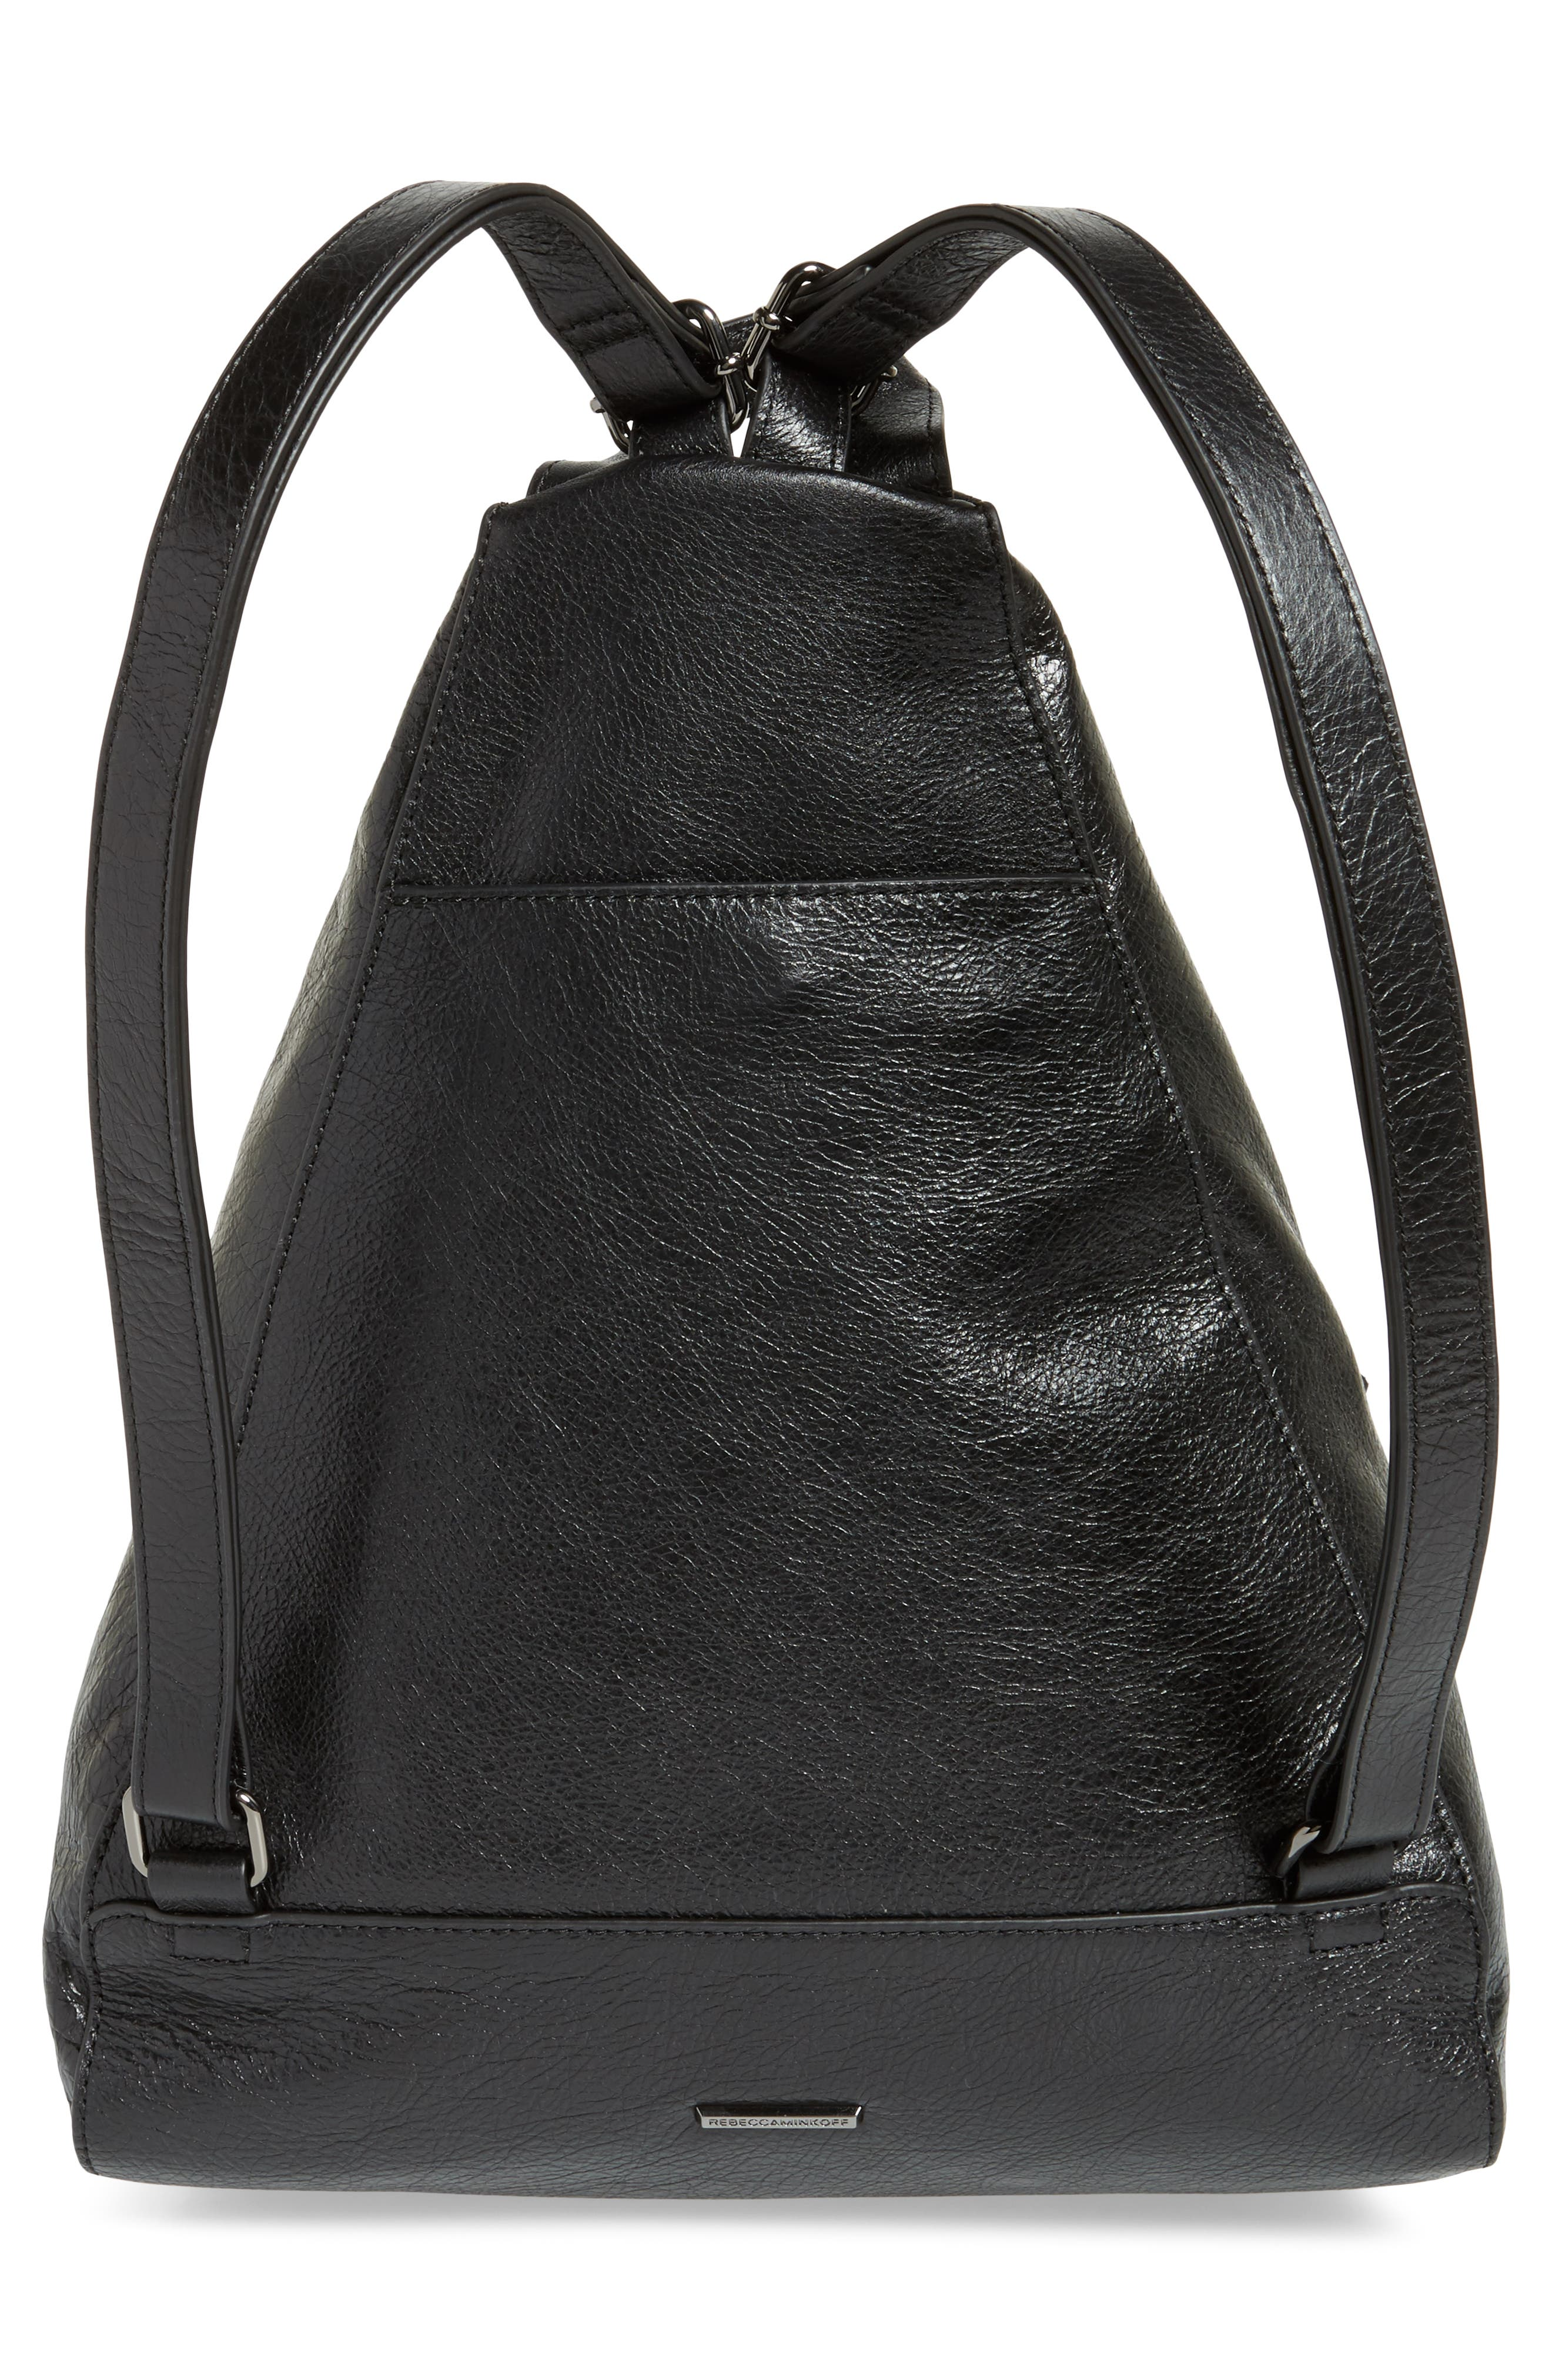 Jamie Nubuck Leather Backpack,                             Alternate thumbnail 3, color,                             001